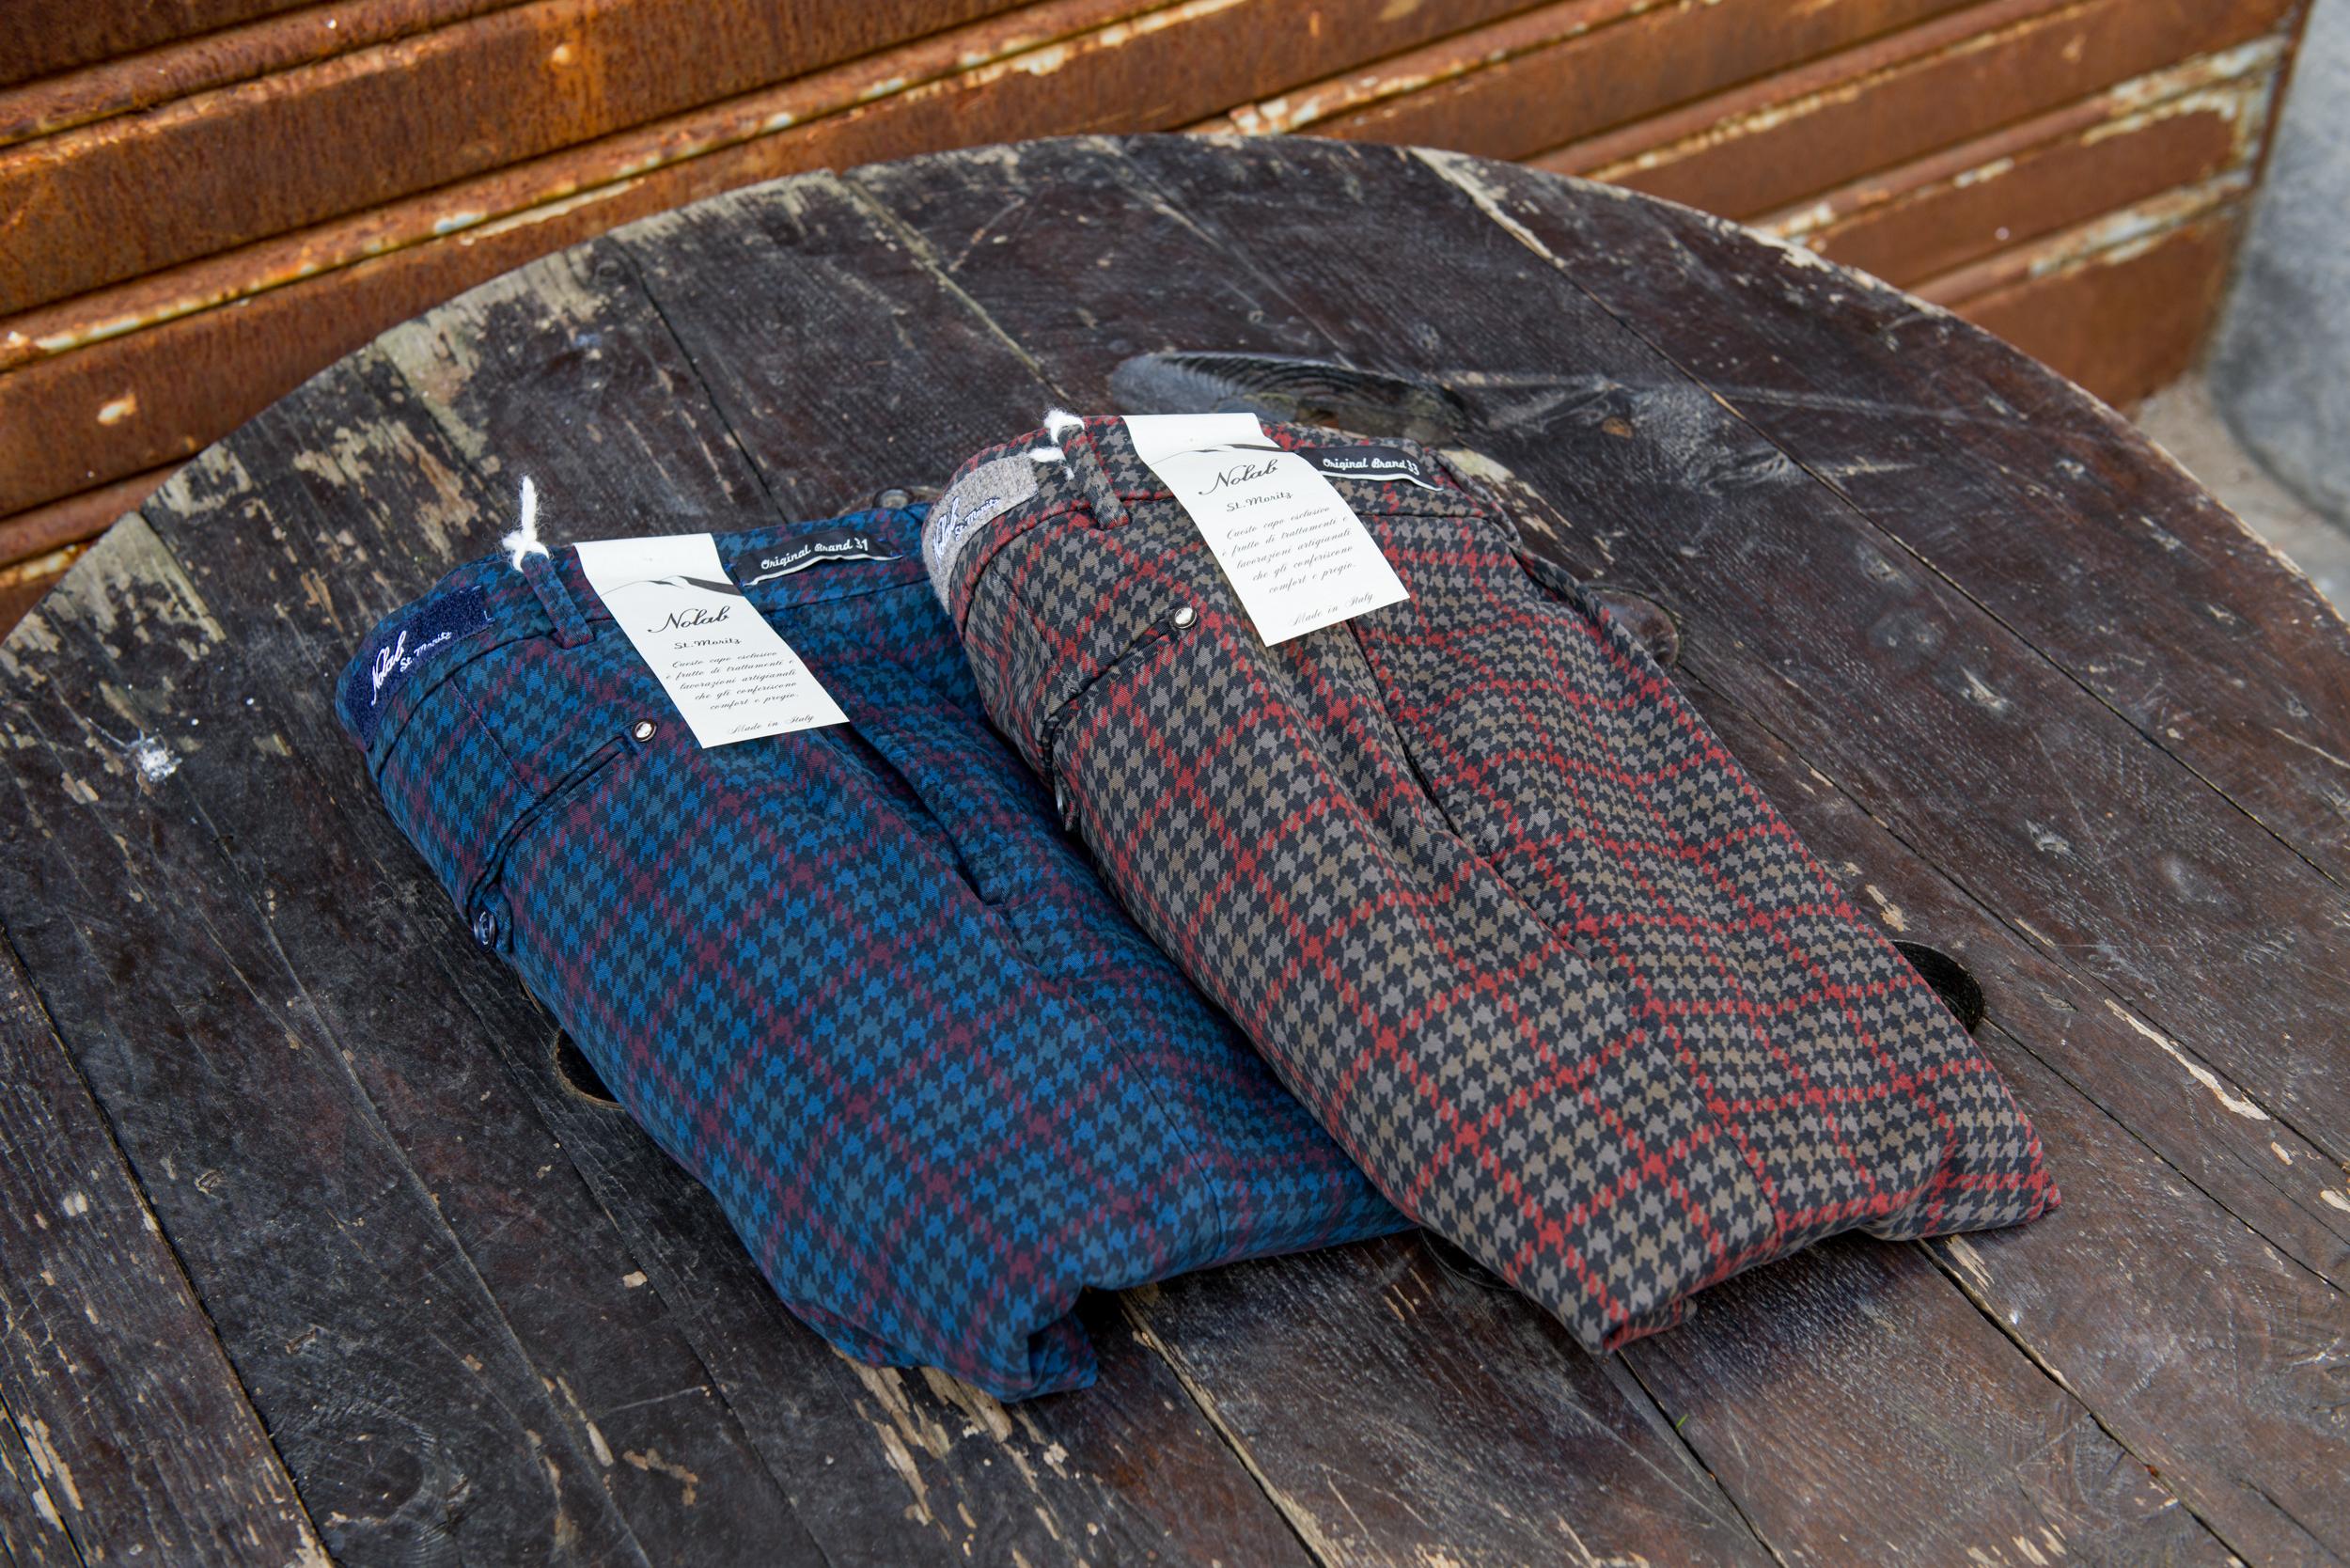 moda-uomo-negozio-style-prato-pantaloni